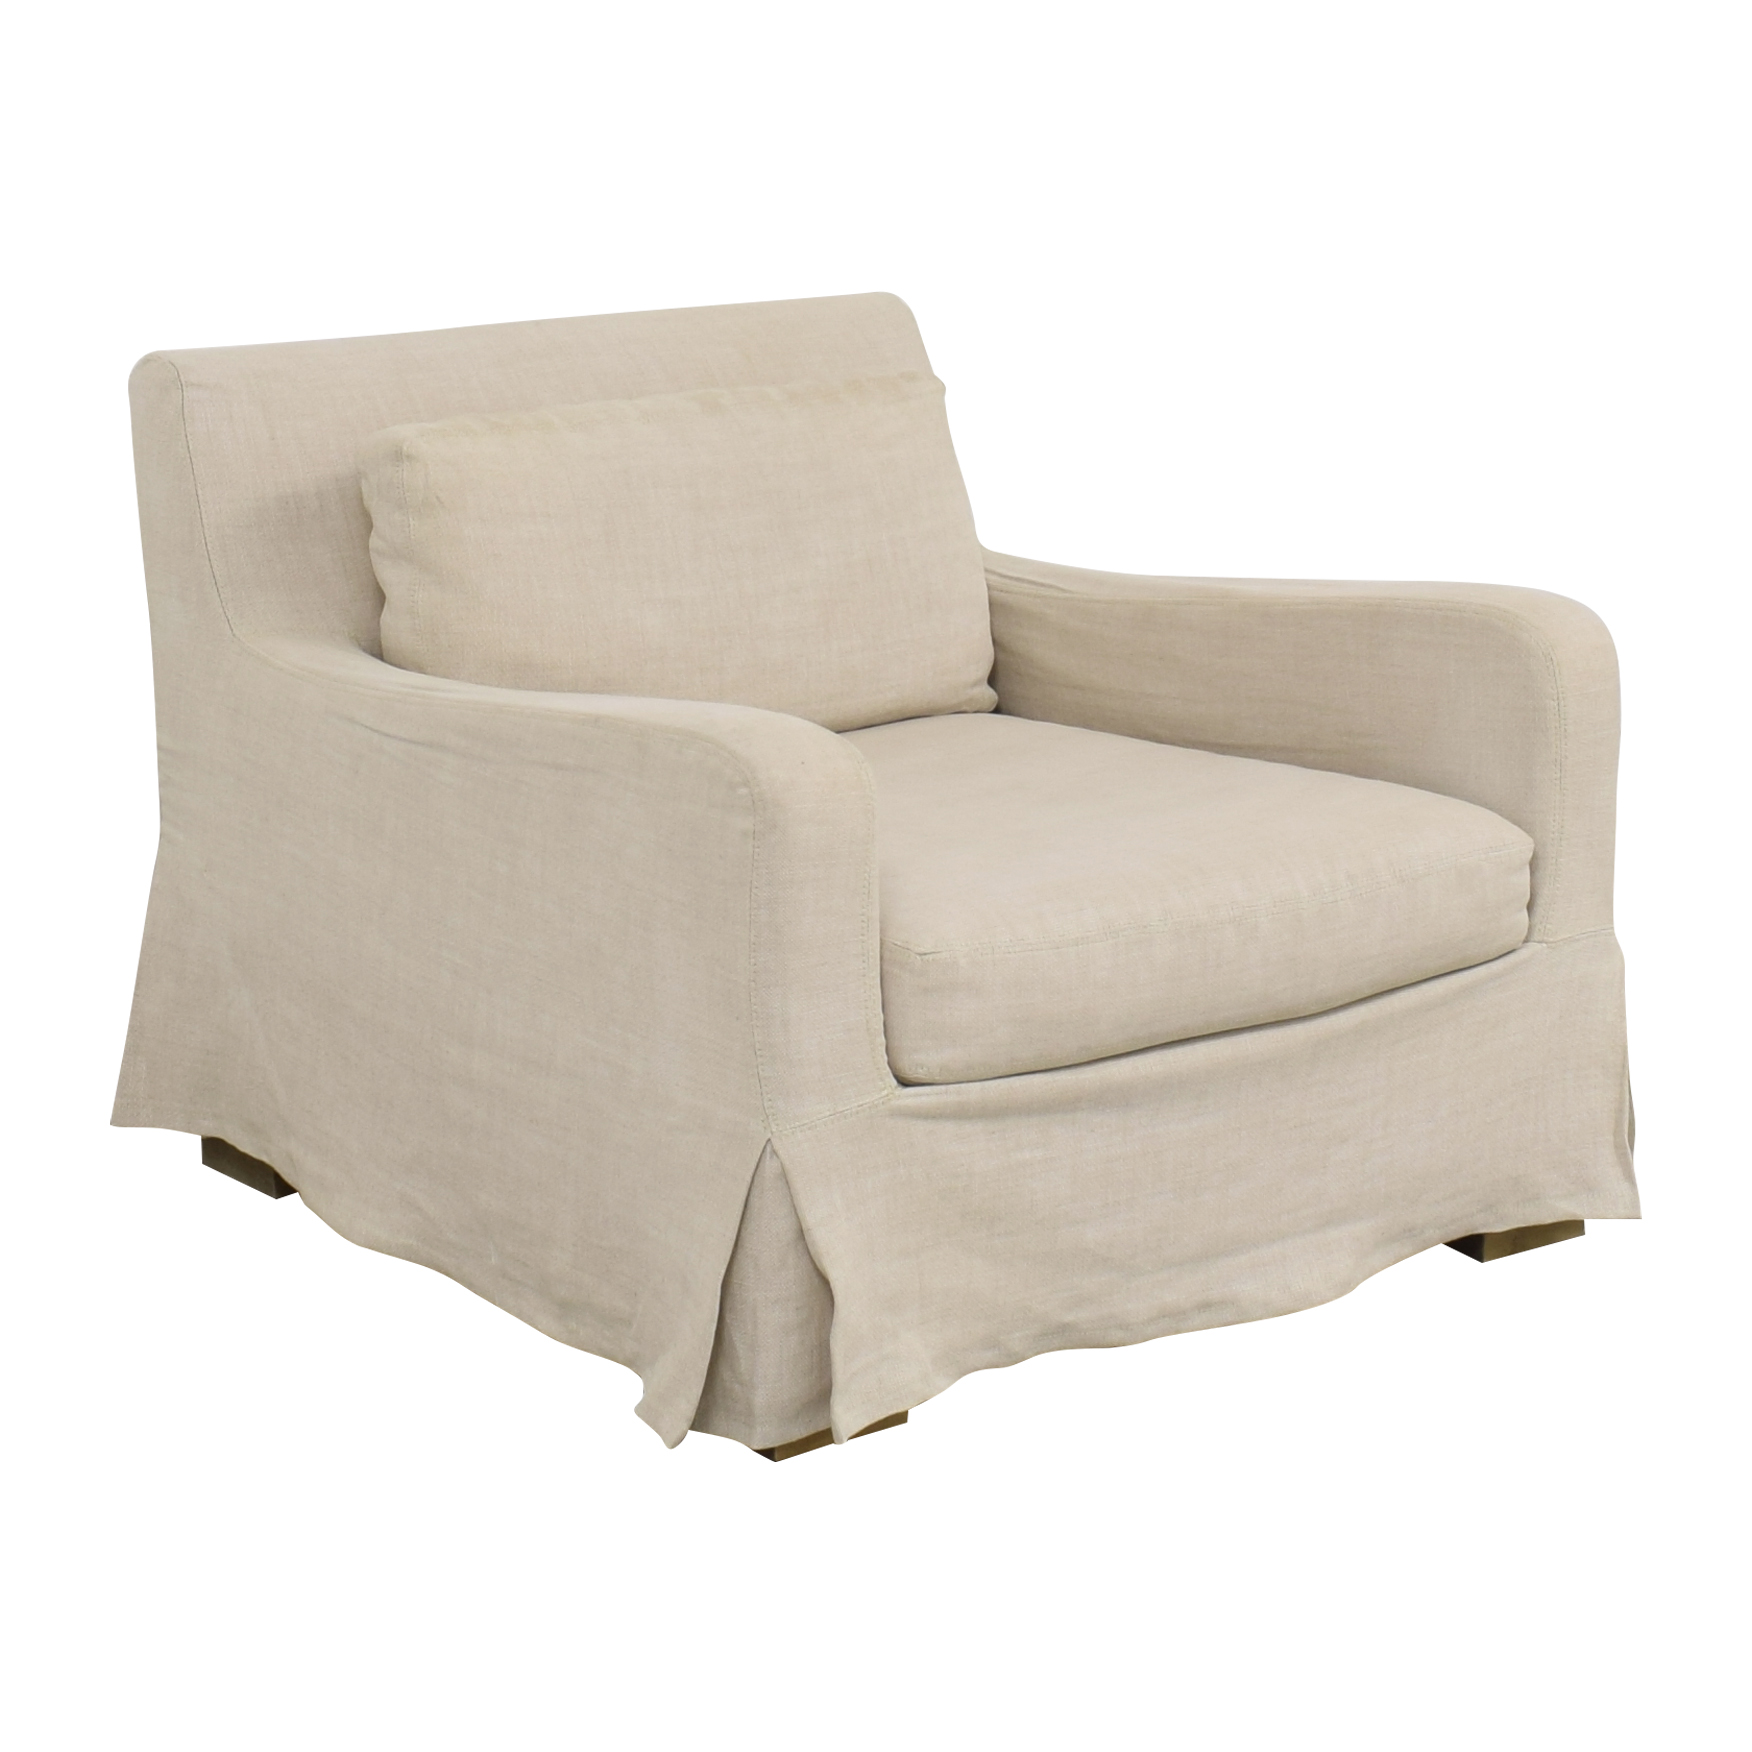 buy Restoration Hardware Belgian Slope Arm Slipcovered Chair Restoration Hardware Accent Chairs